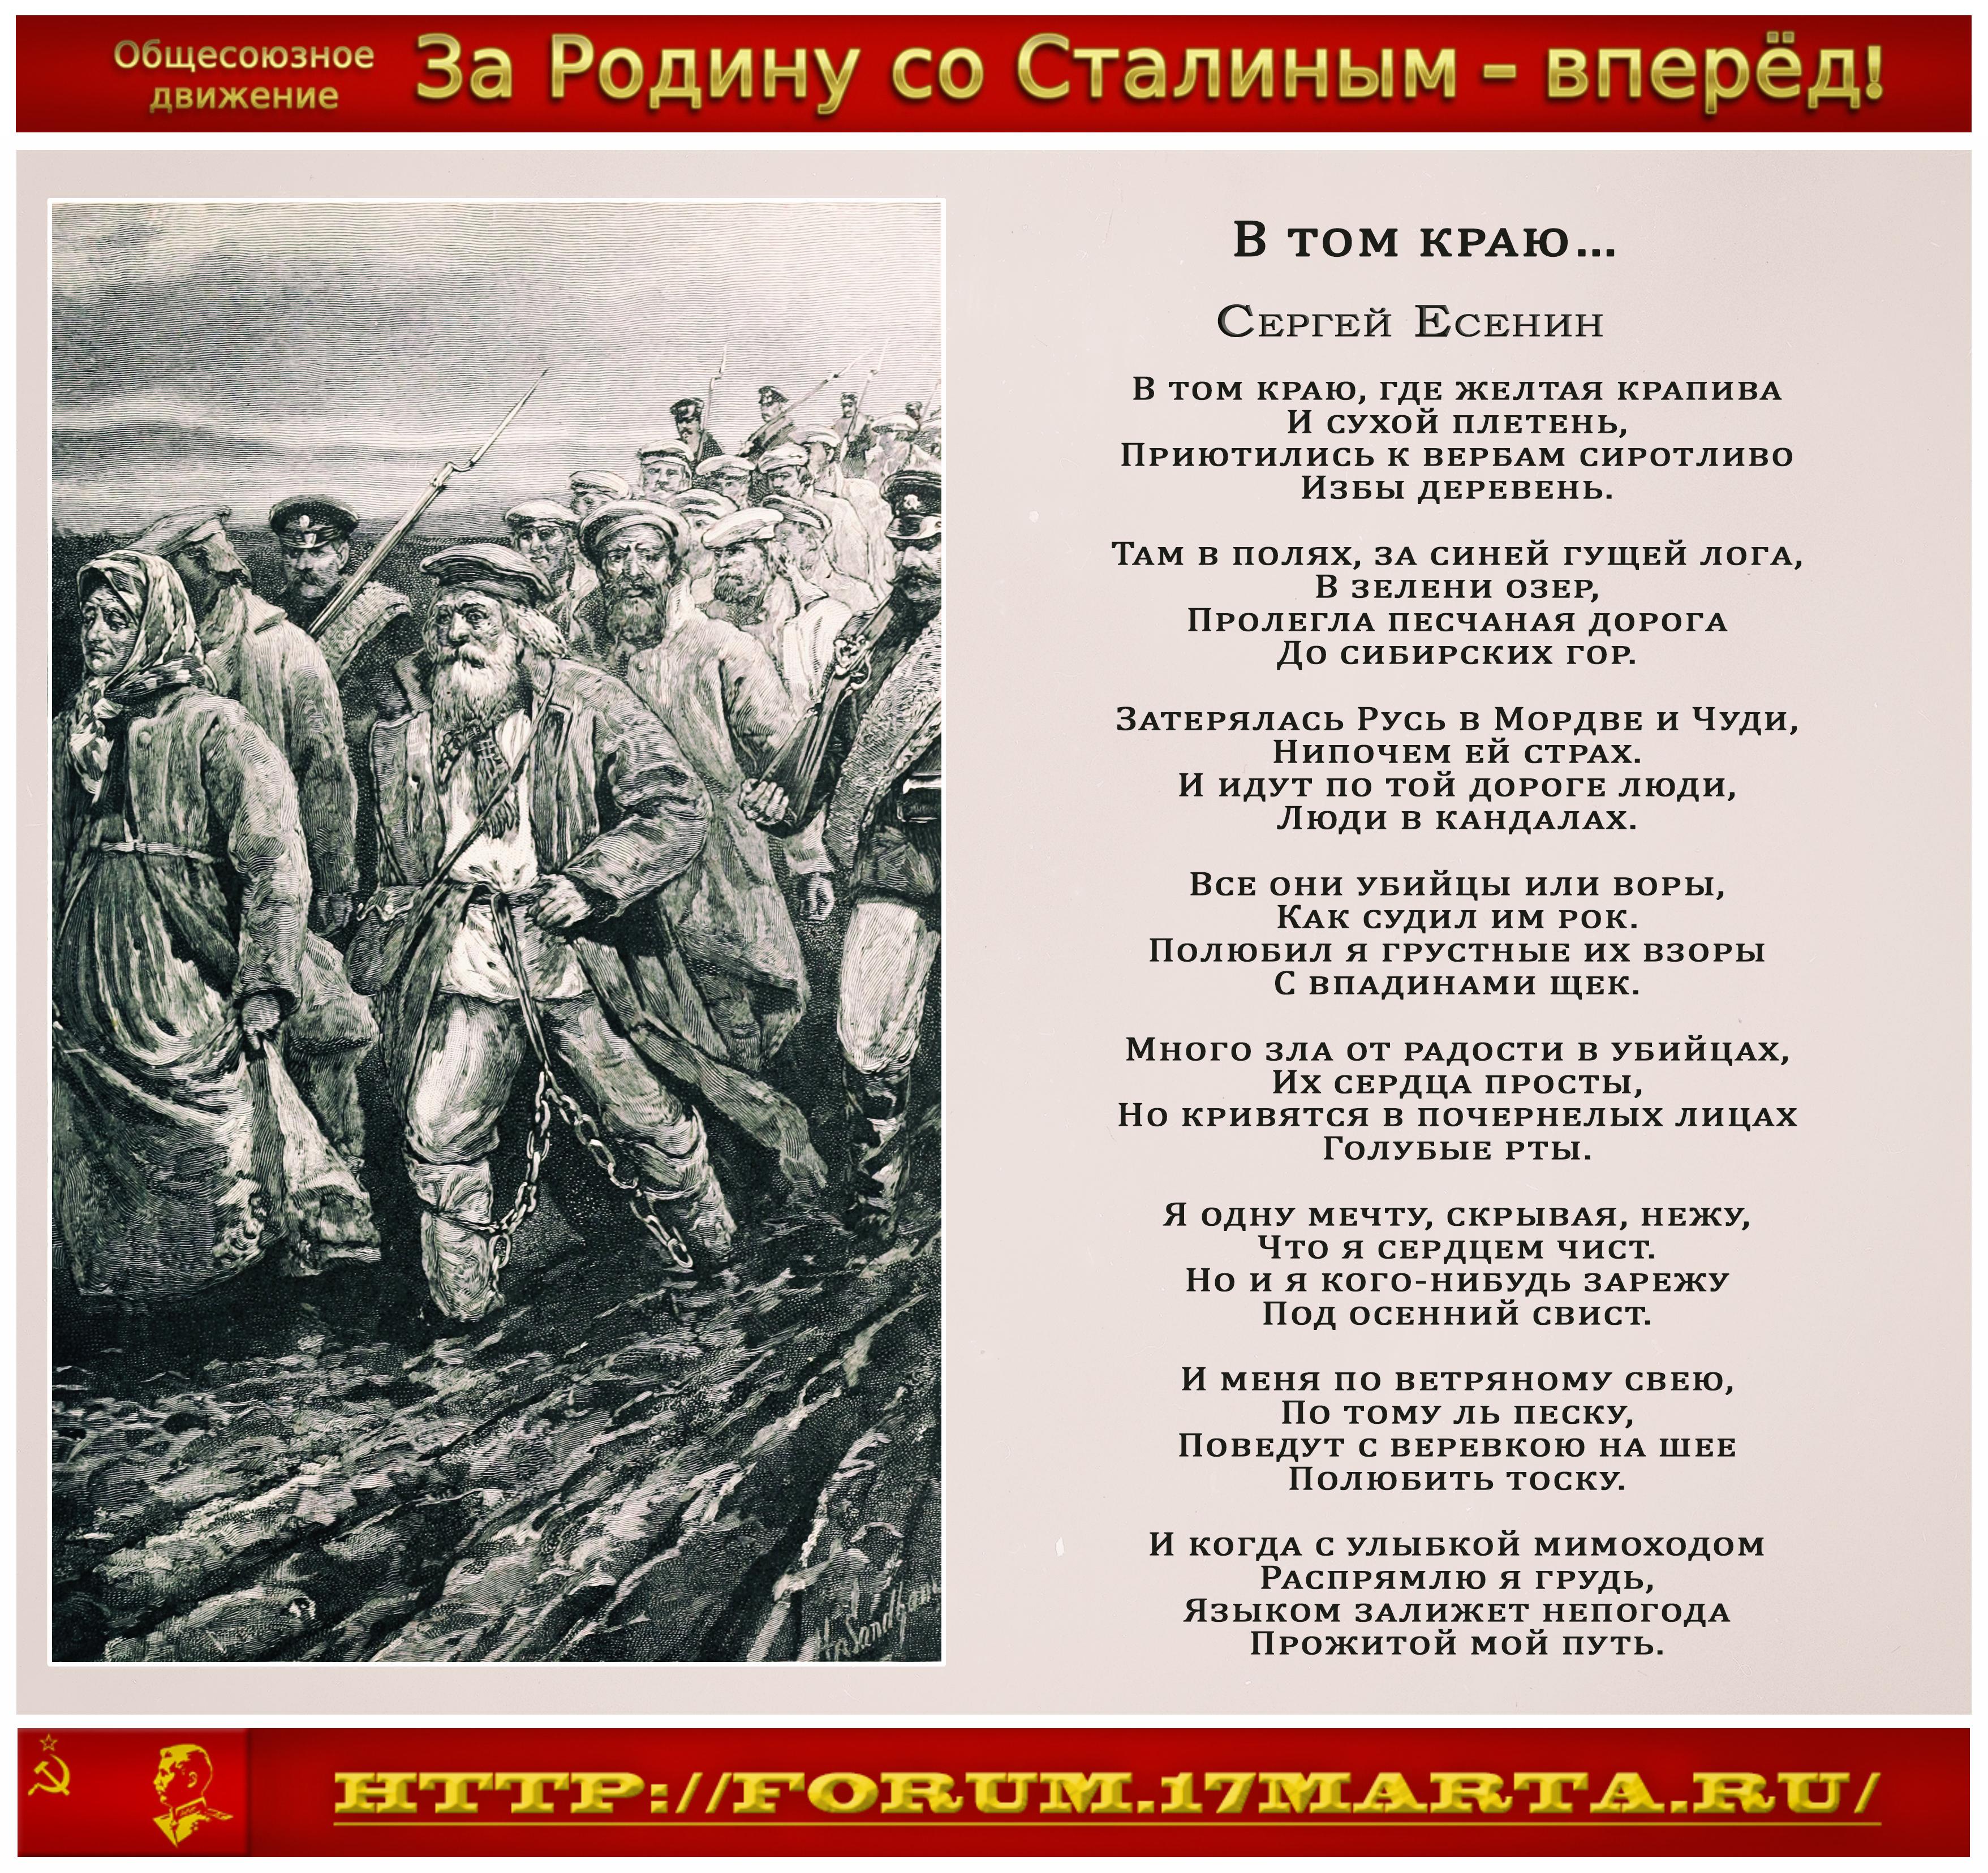 https://images.vfl.ru/ii/1531634980/977e5b2e/22488688.jpg